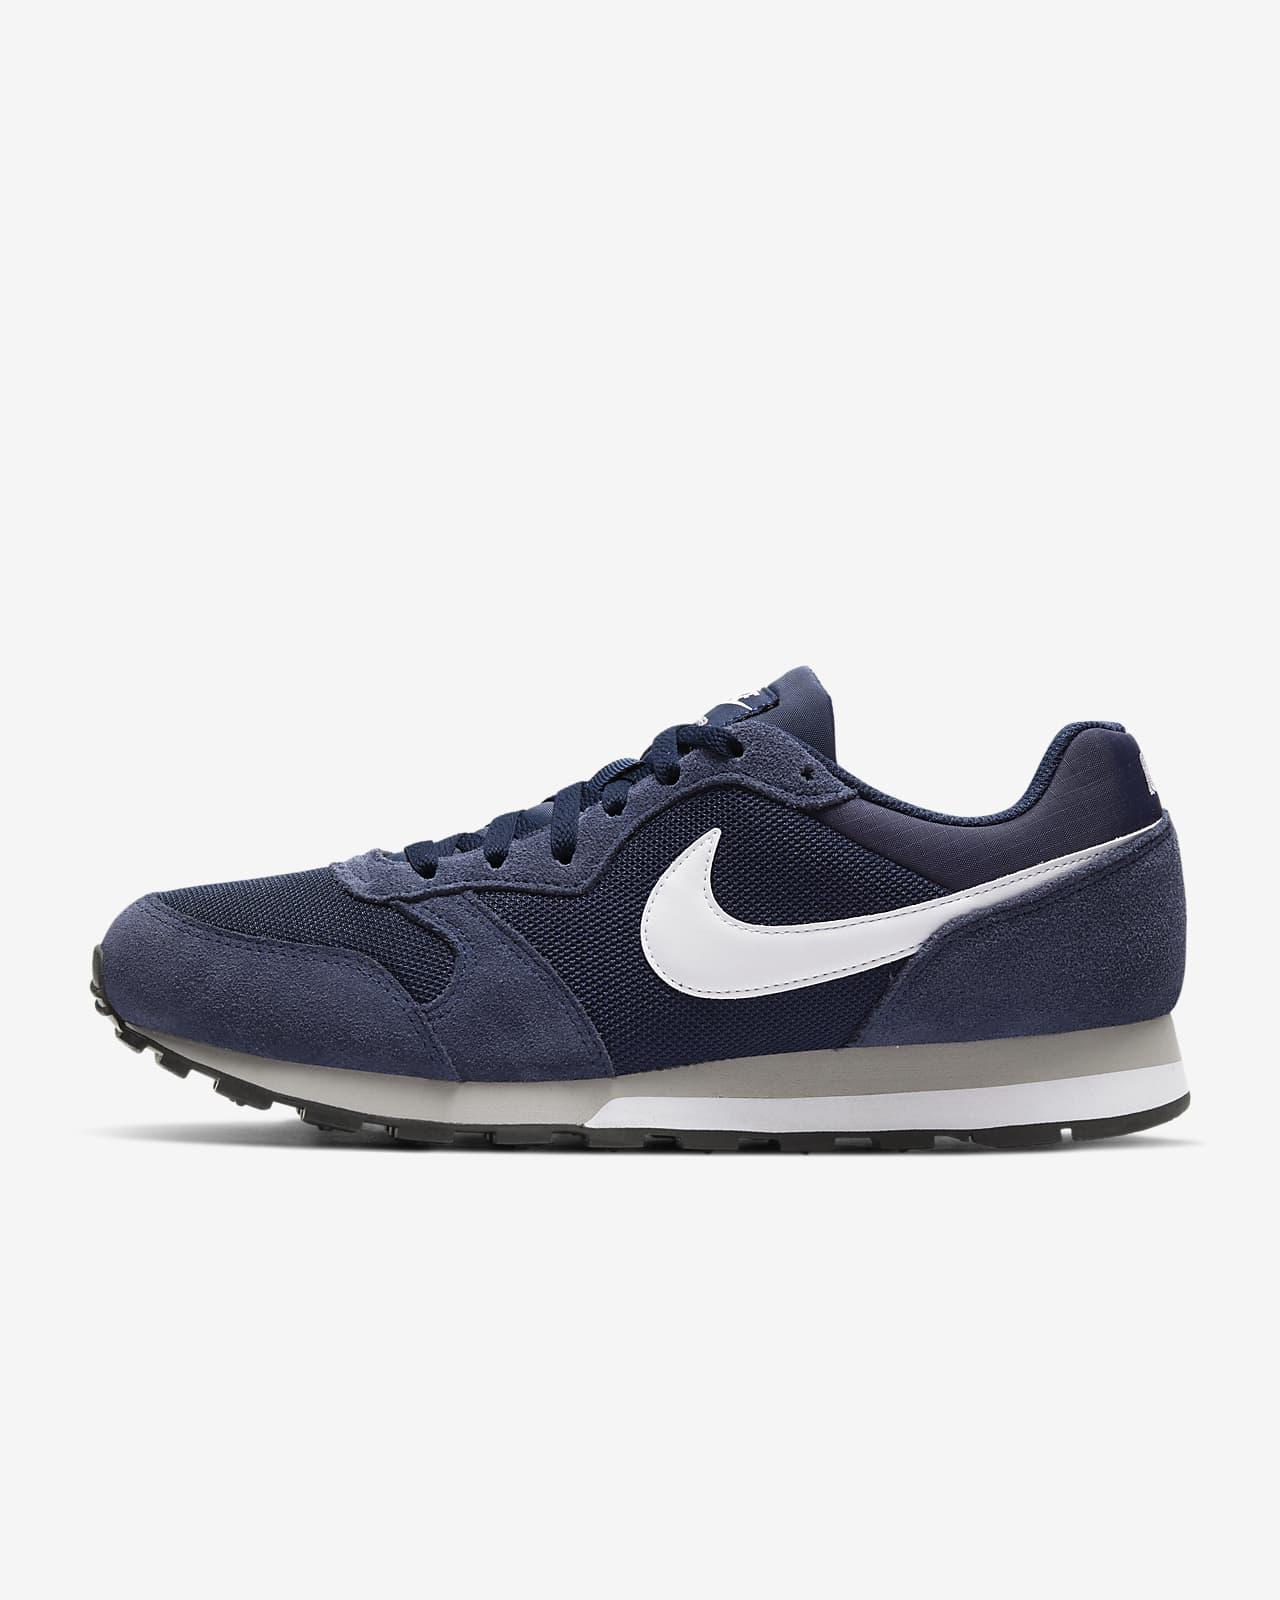 dos Carteles Familiarizarse  Nike MD Runner 2 Men's Shoe. Nike LU